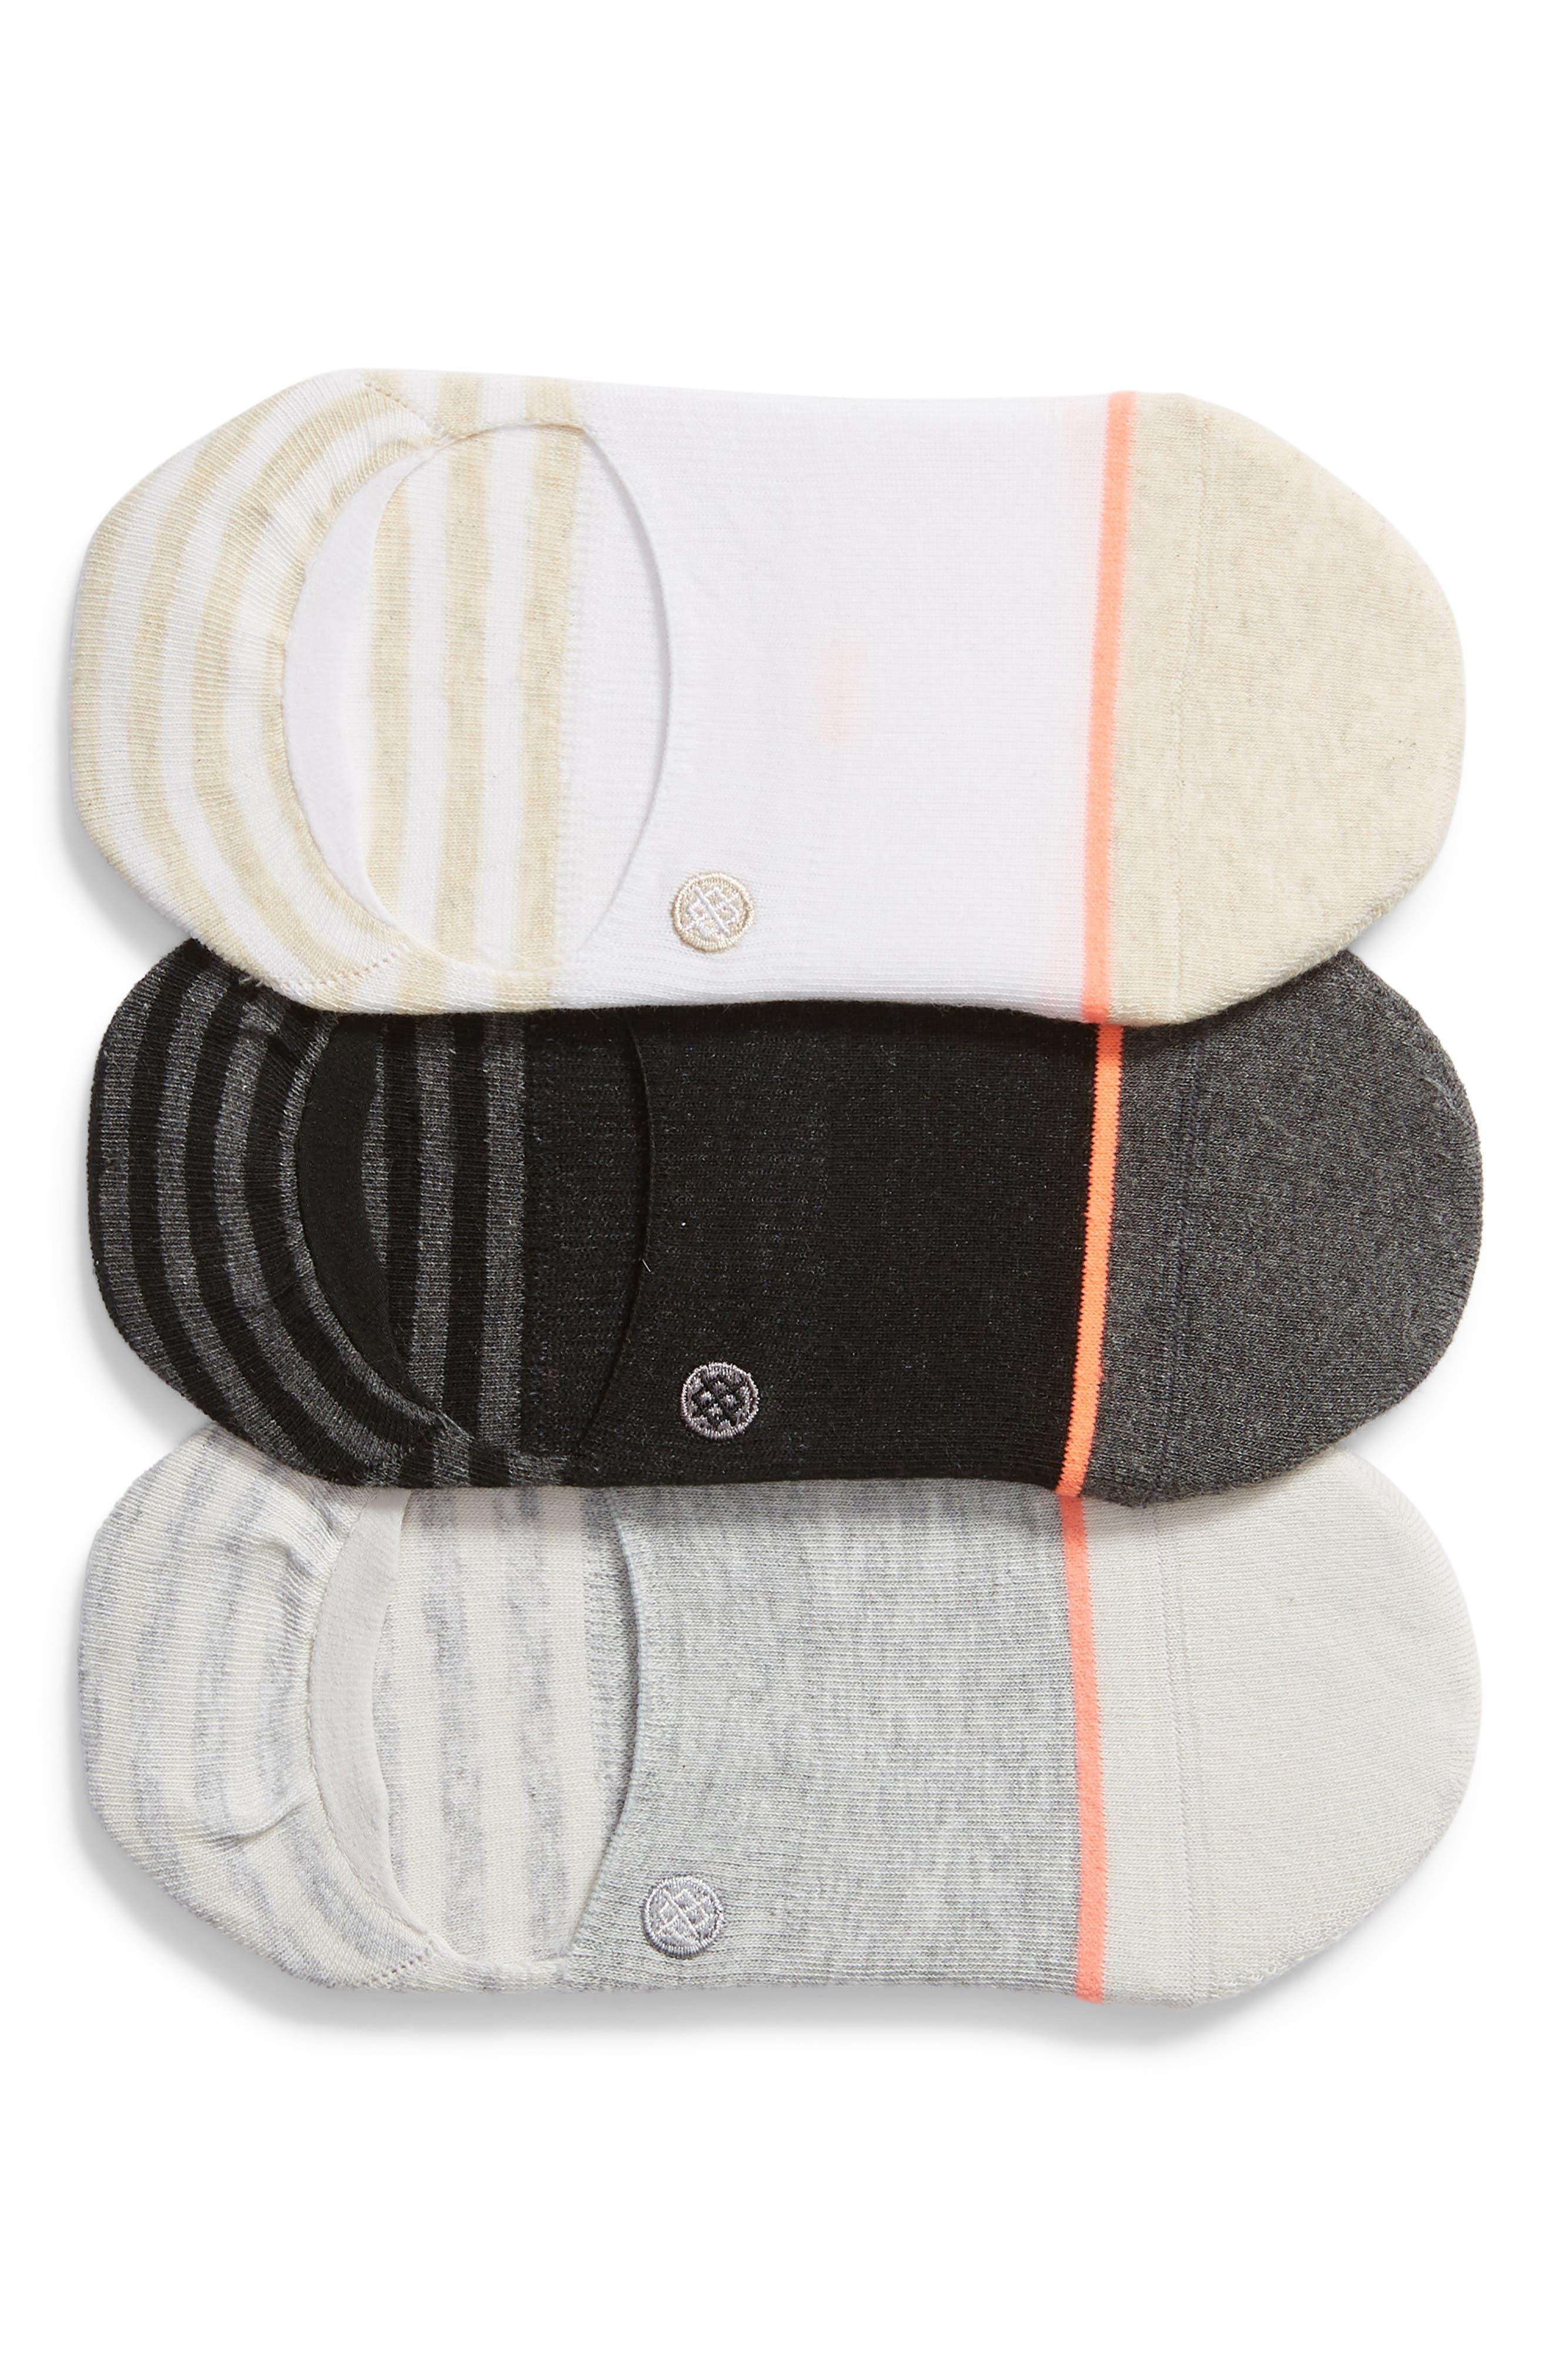 Stance Sensible 3-Pack No-Show Socks